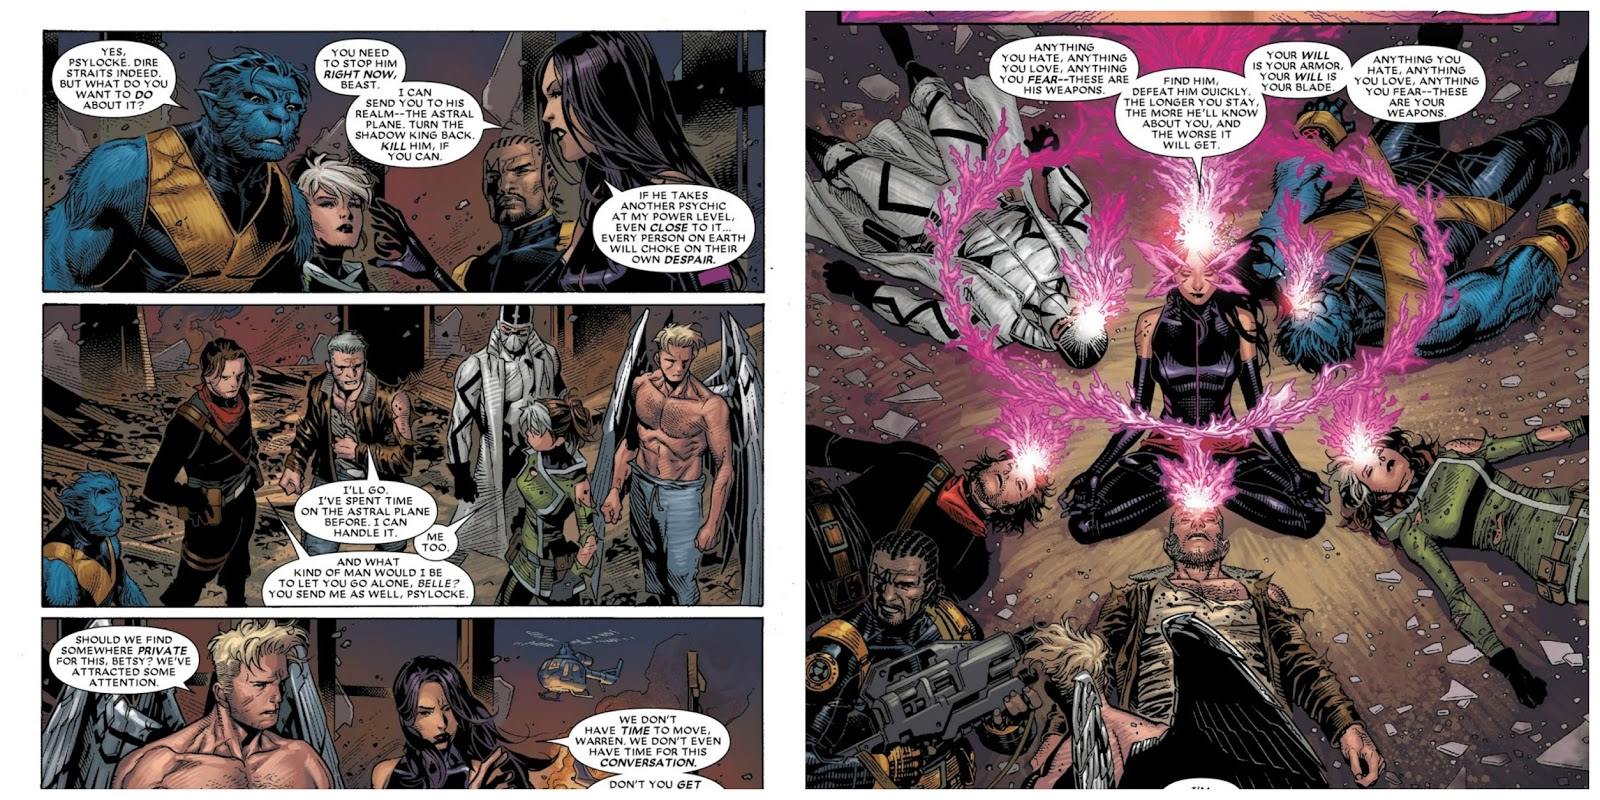 Brothascomics: Astonishing X-Men #1 Review